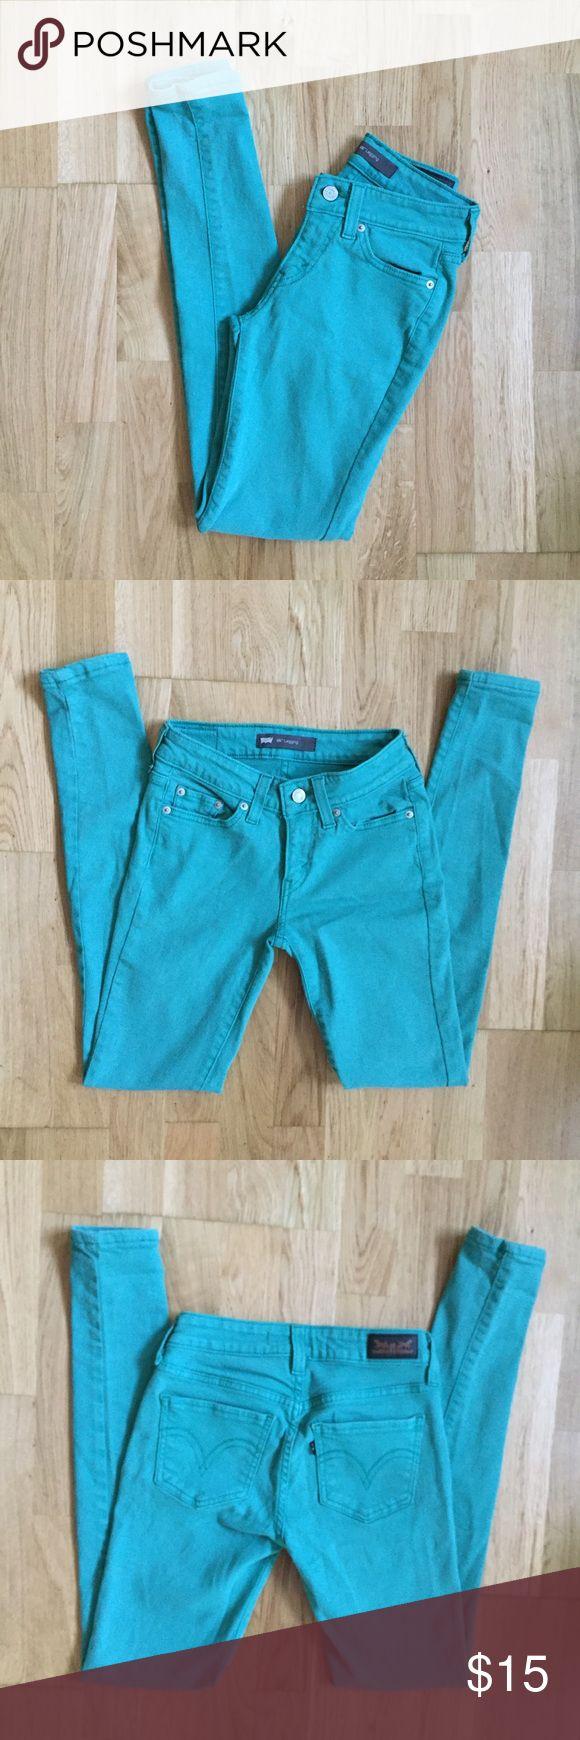 Levi's 535 Teal Skinny Jeans Like new, zero flaws Levi's Jeans Skinny